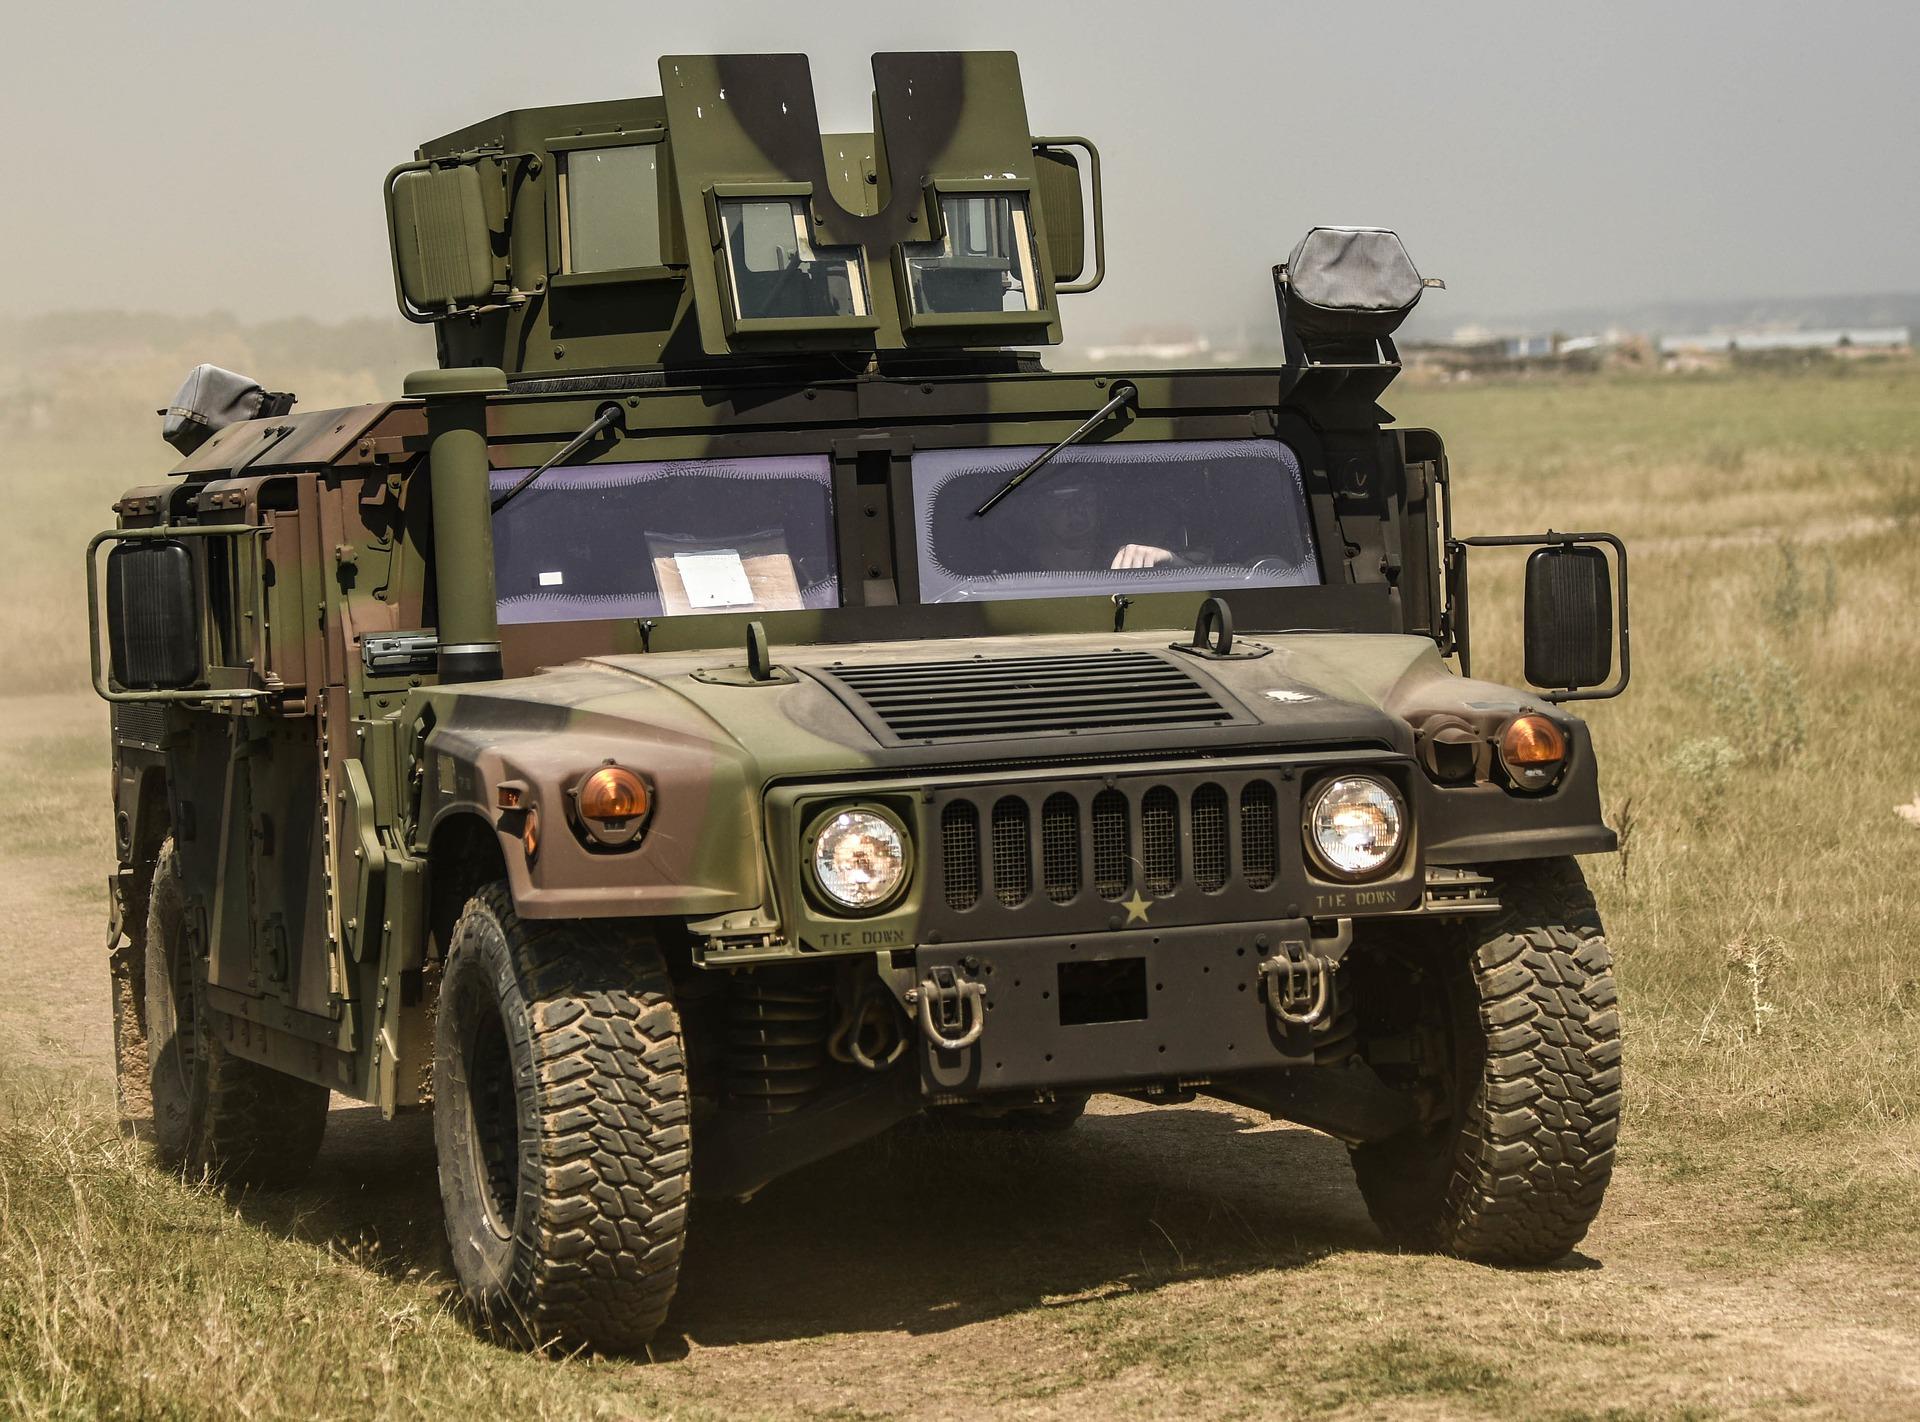 us-army-2526752_1920.jpg